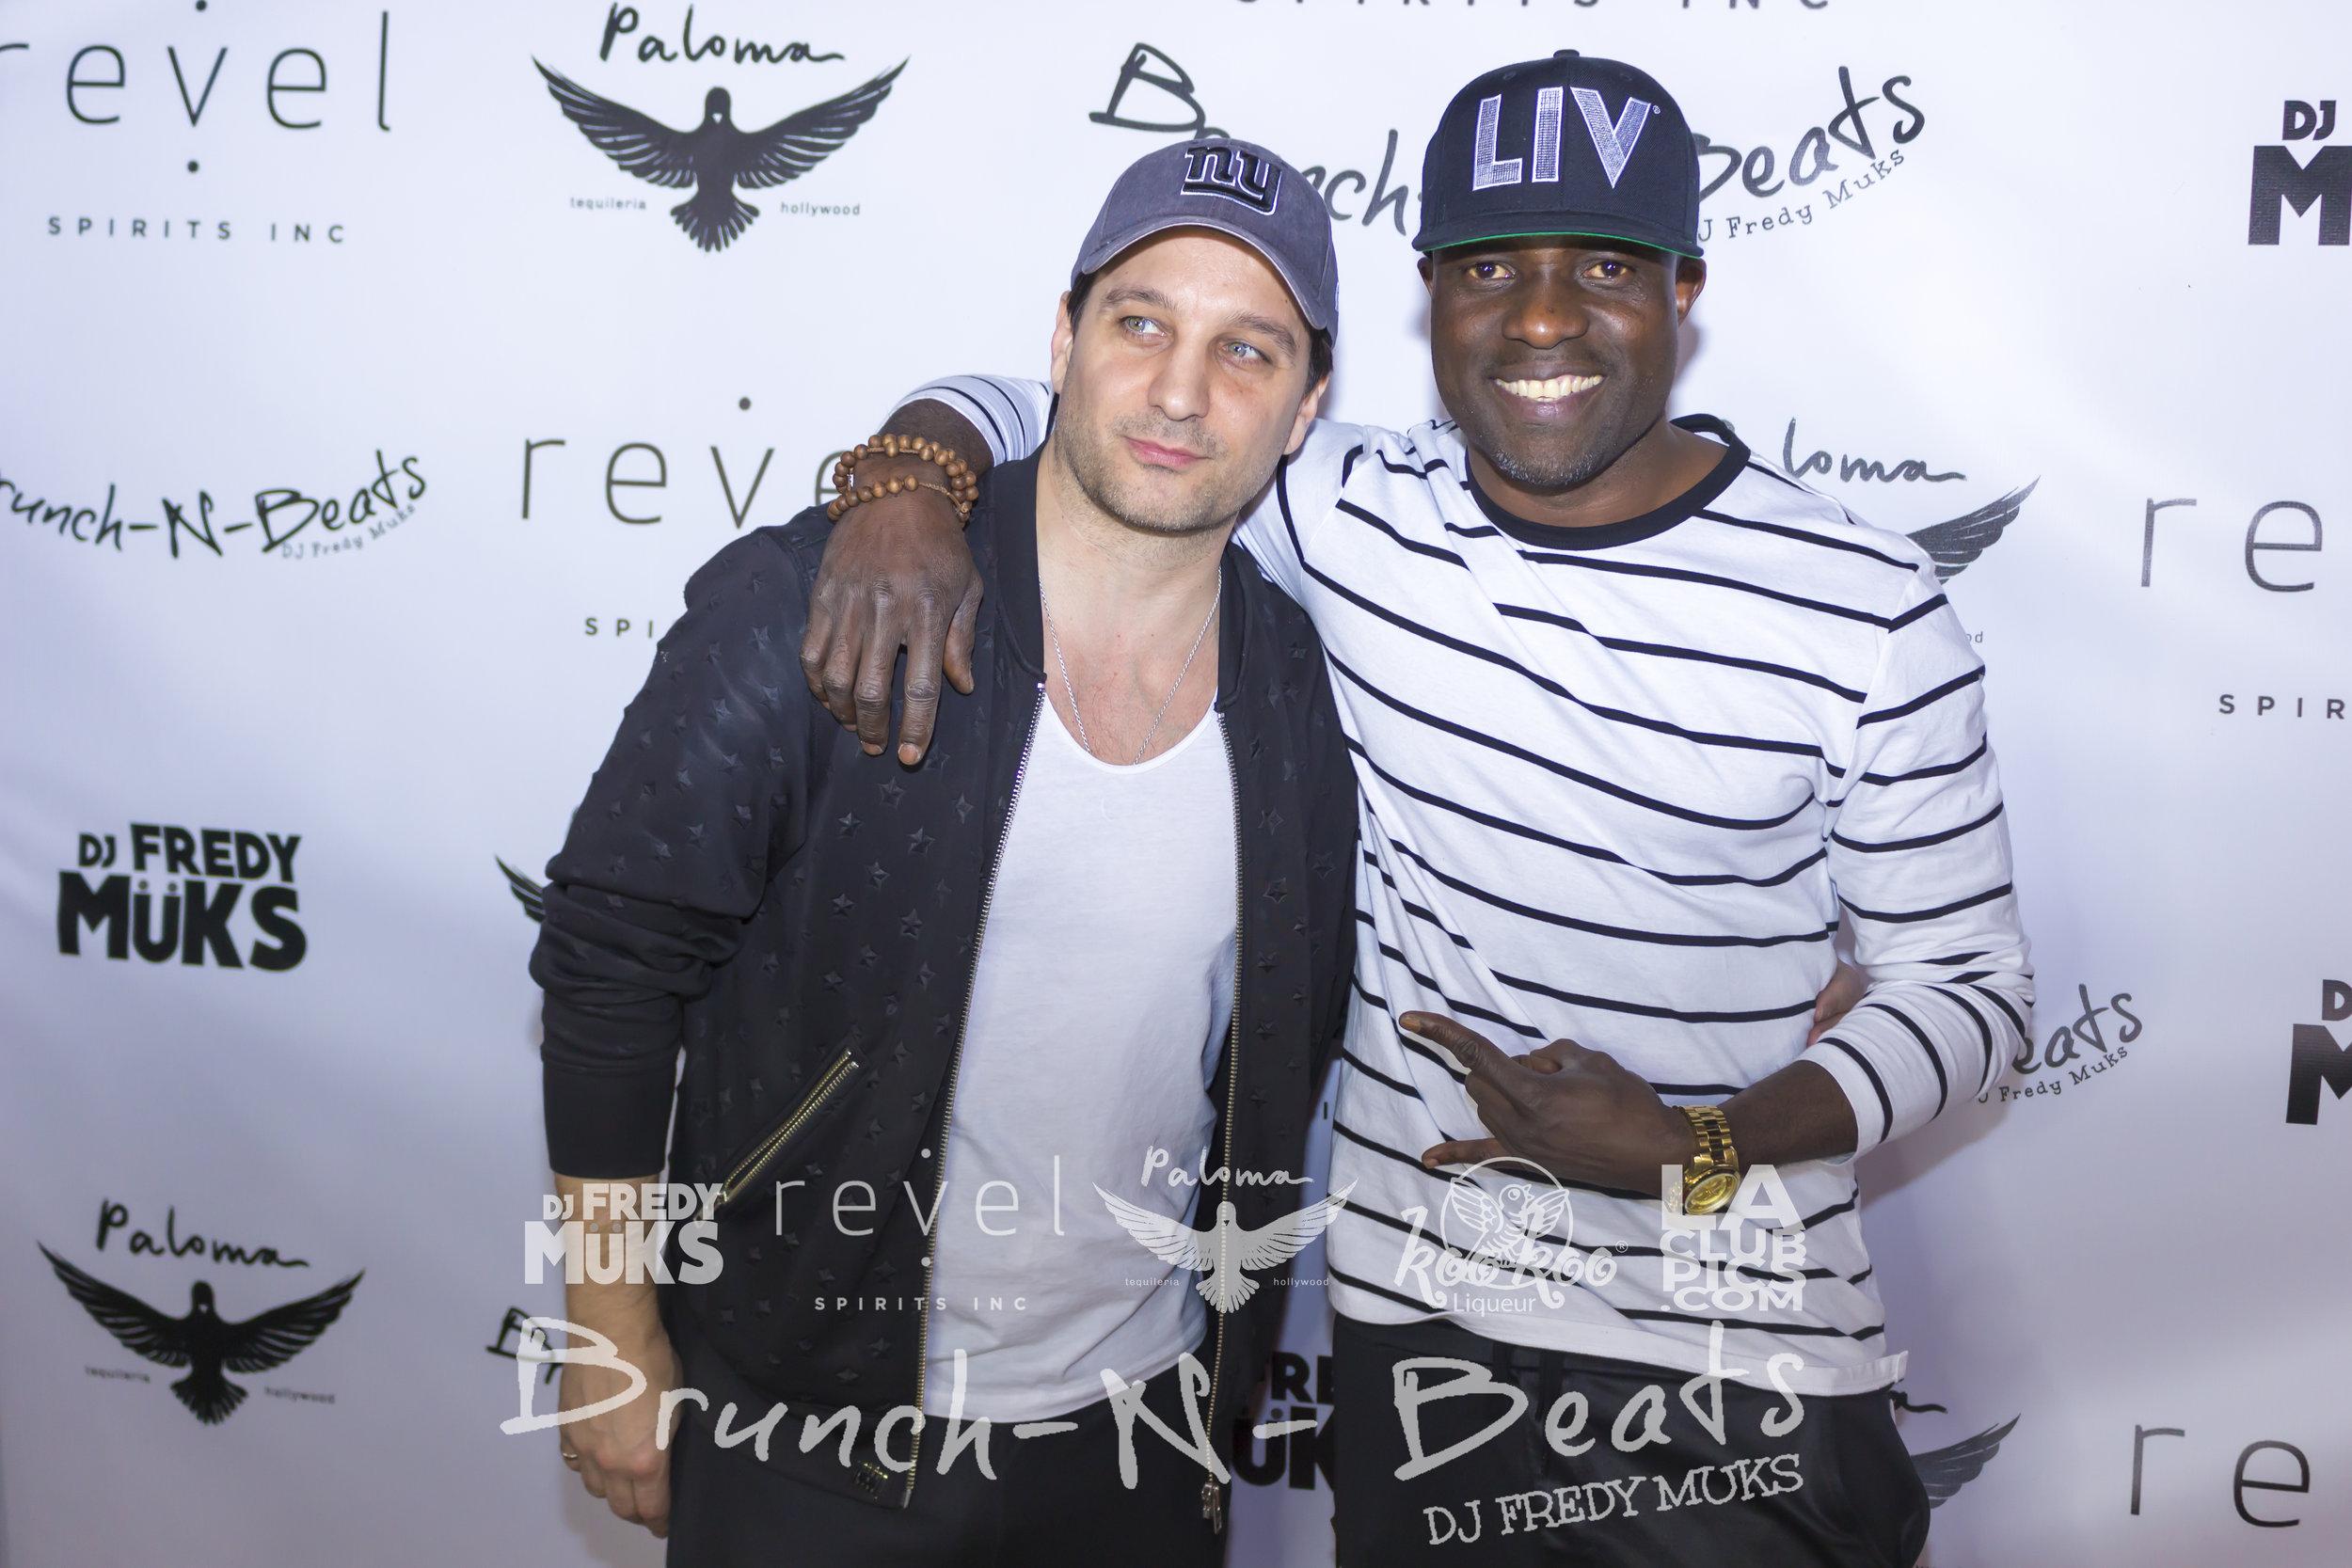 Brunch-N-Beats - Paloma Hollywood - 02-25-18_172.jpg